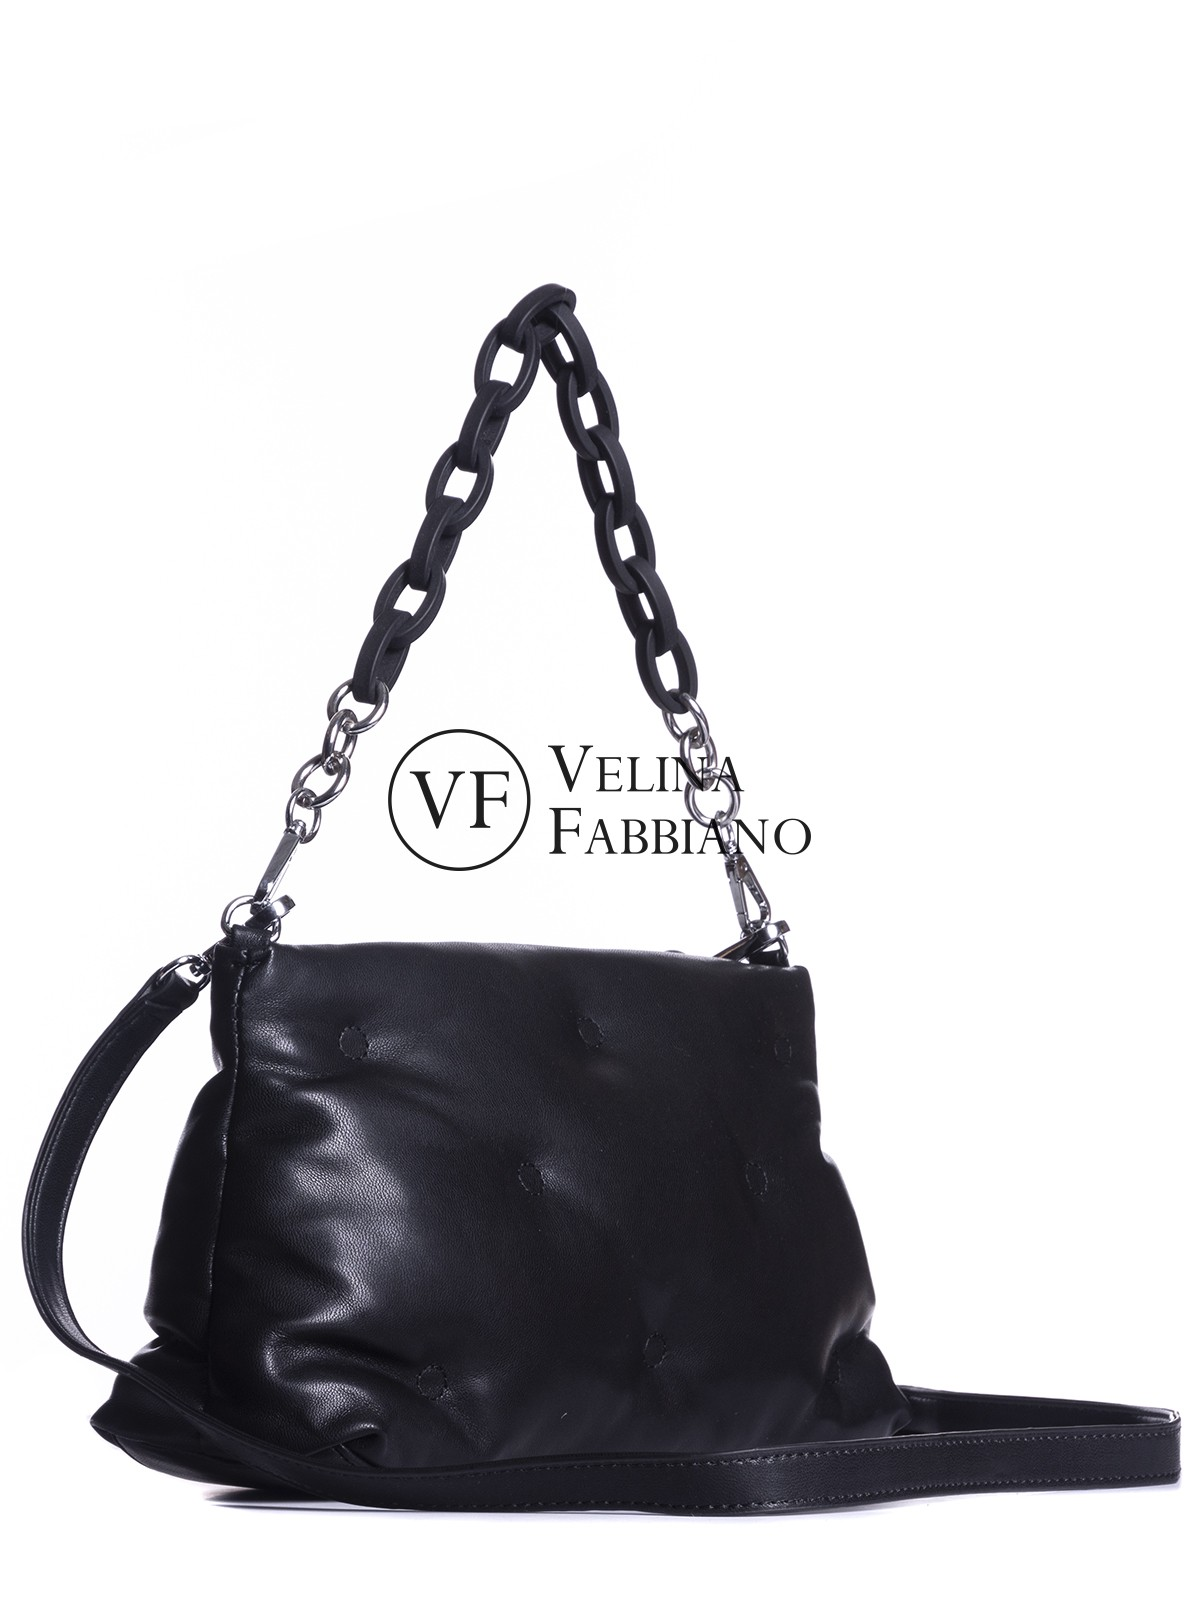 Кросс-боди Velina Fabbiano 553331-black